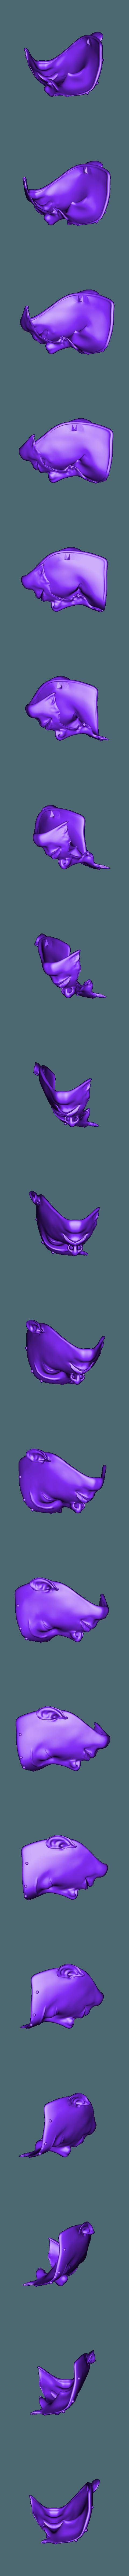 266461.stl Download free STL file Guanghan Palace  Change Fairy • 3D printable design, stronghero3d